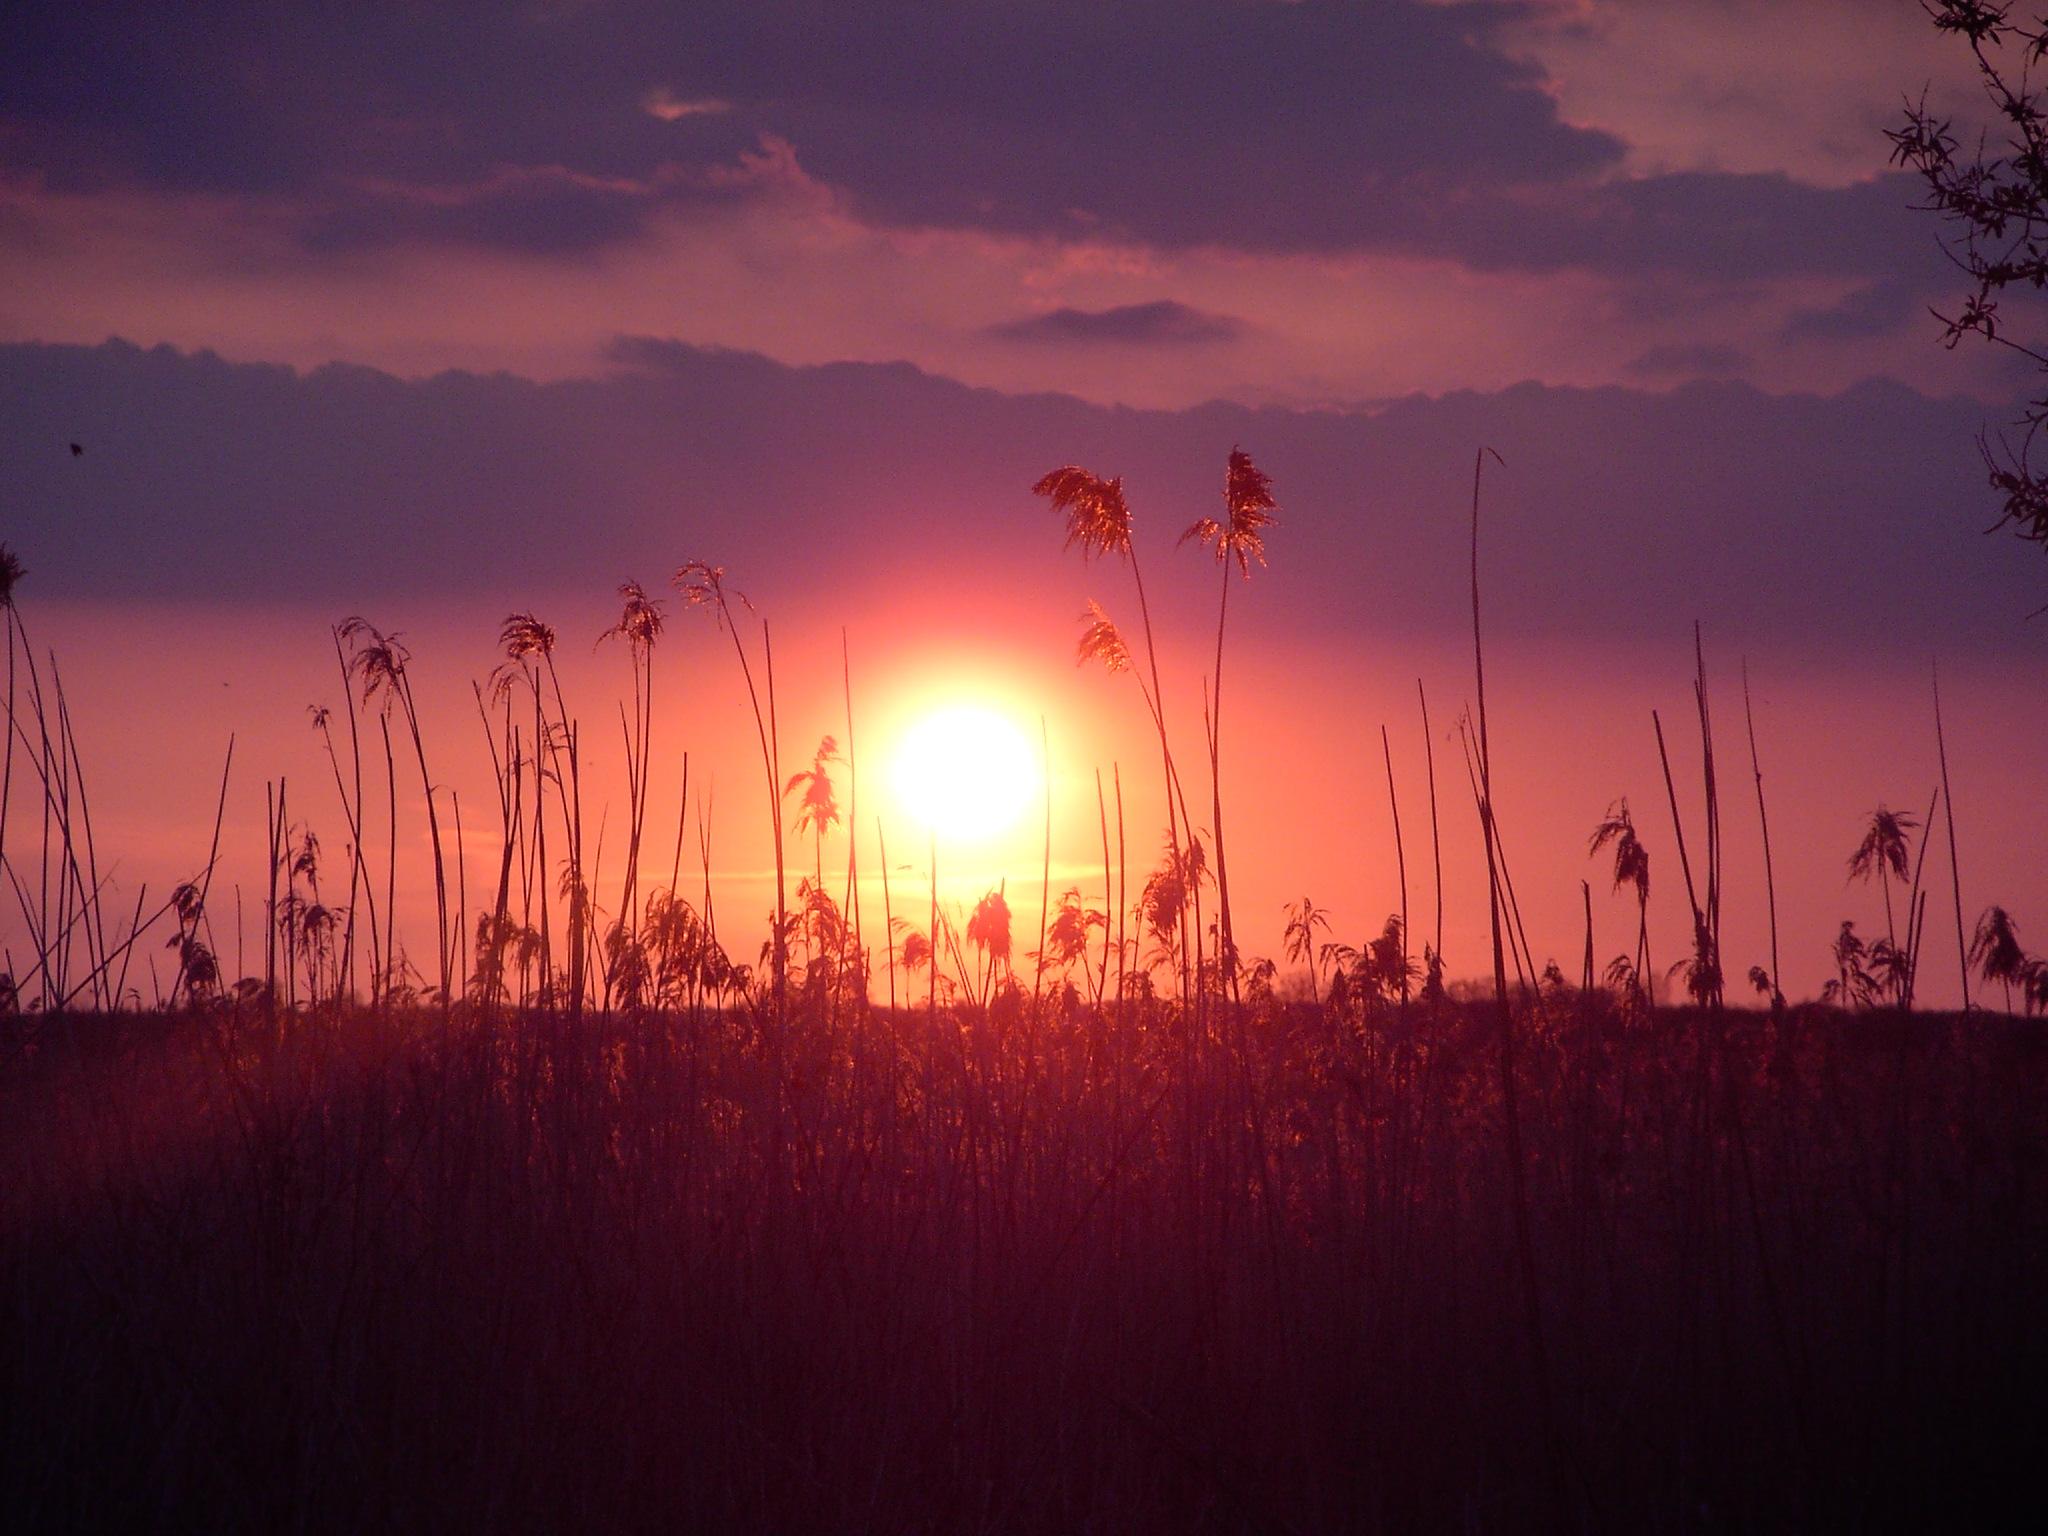 File:Long Point Sunset.jpg - Wikipedia   title   sunset in november